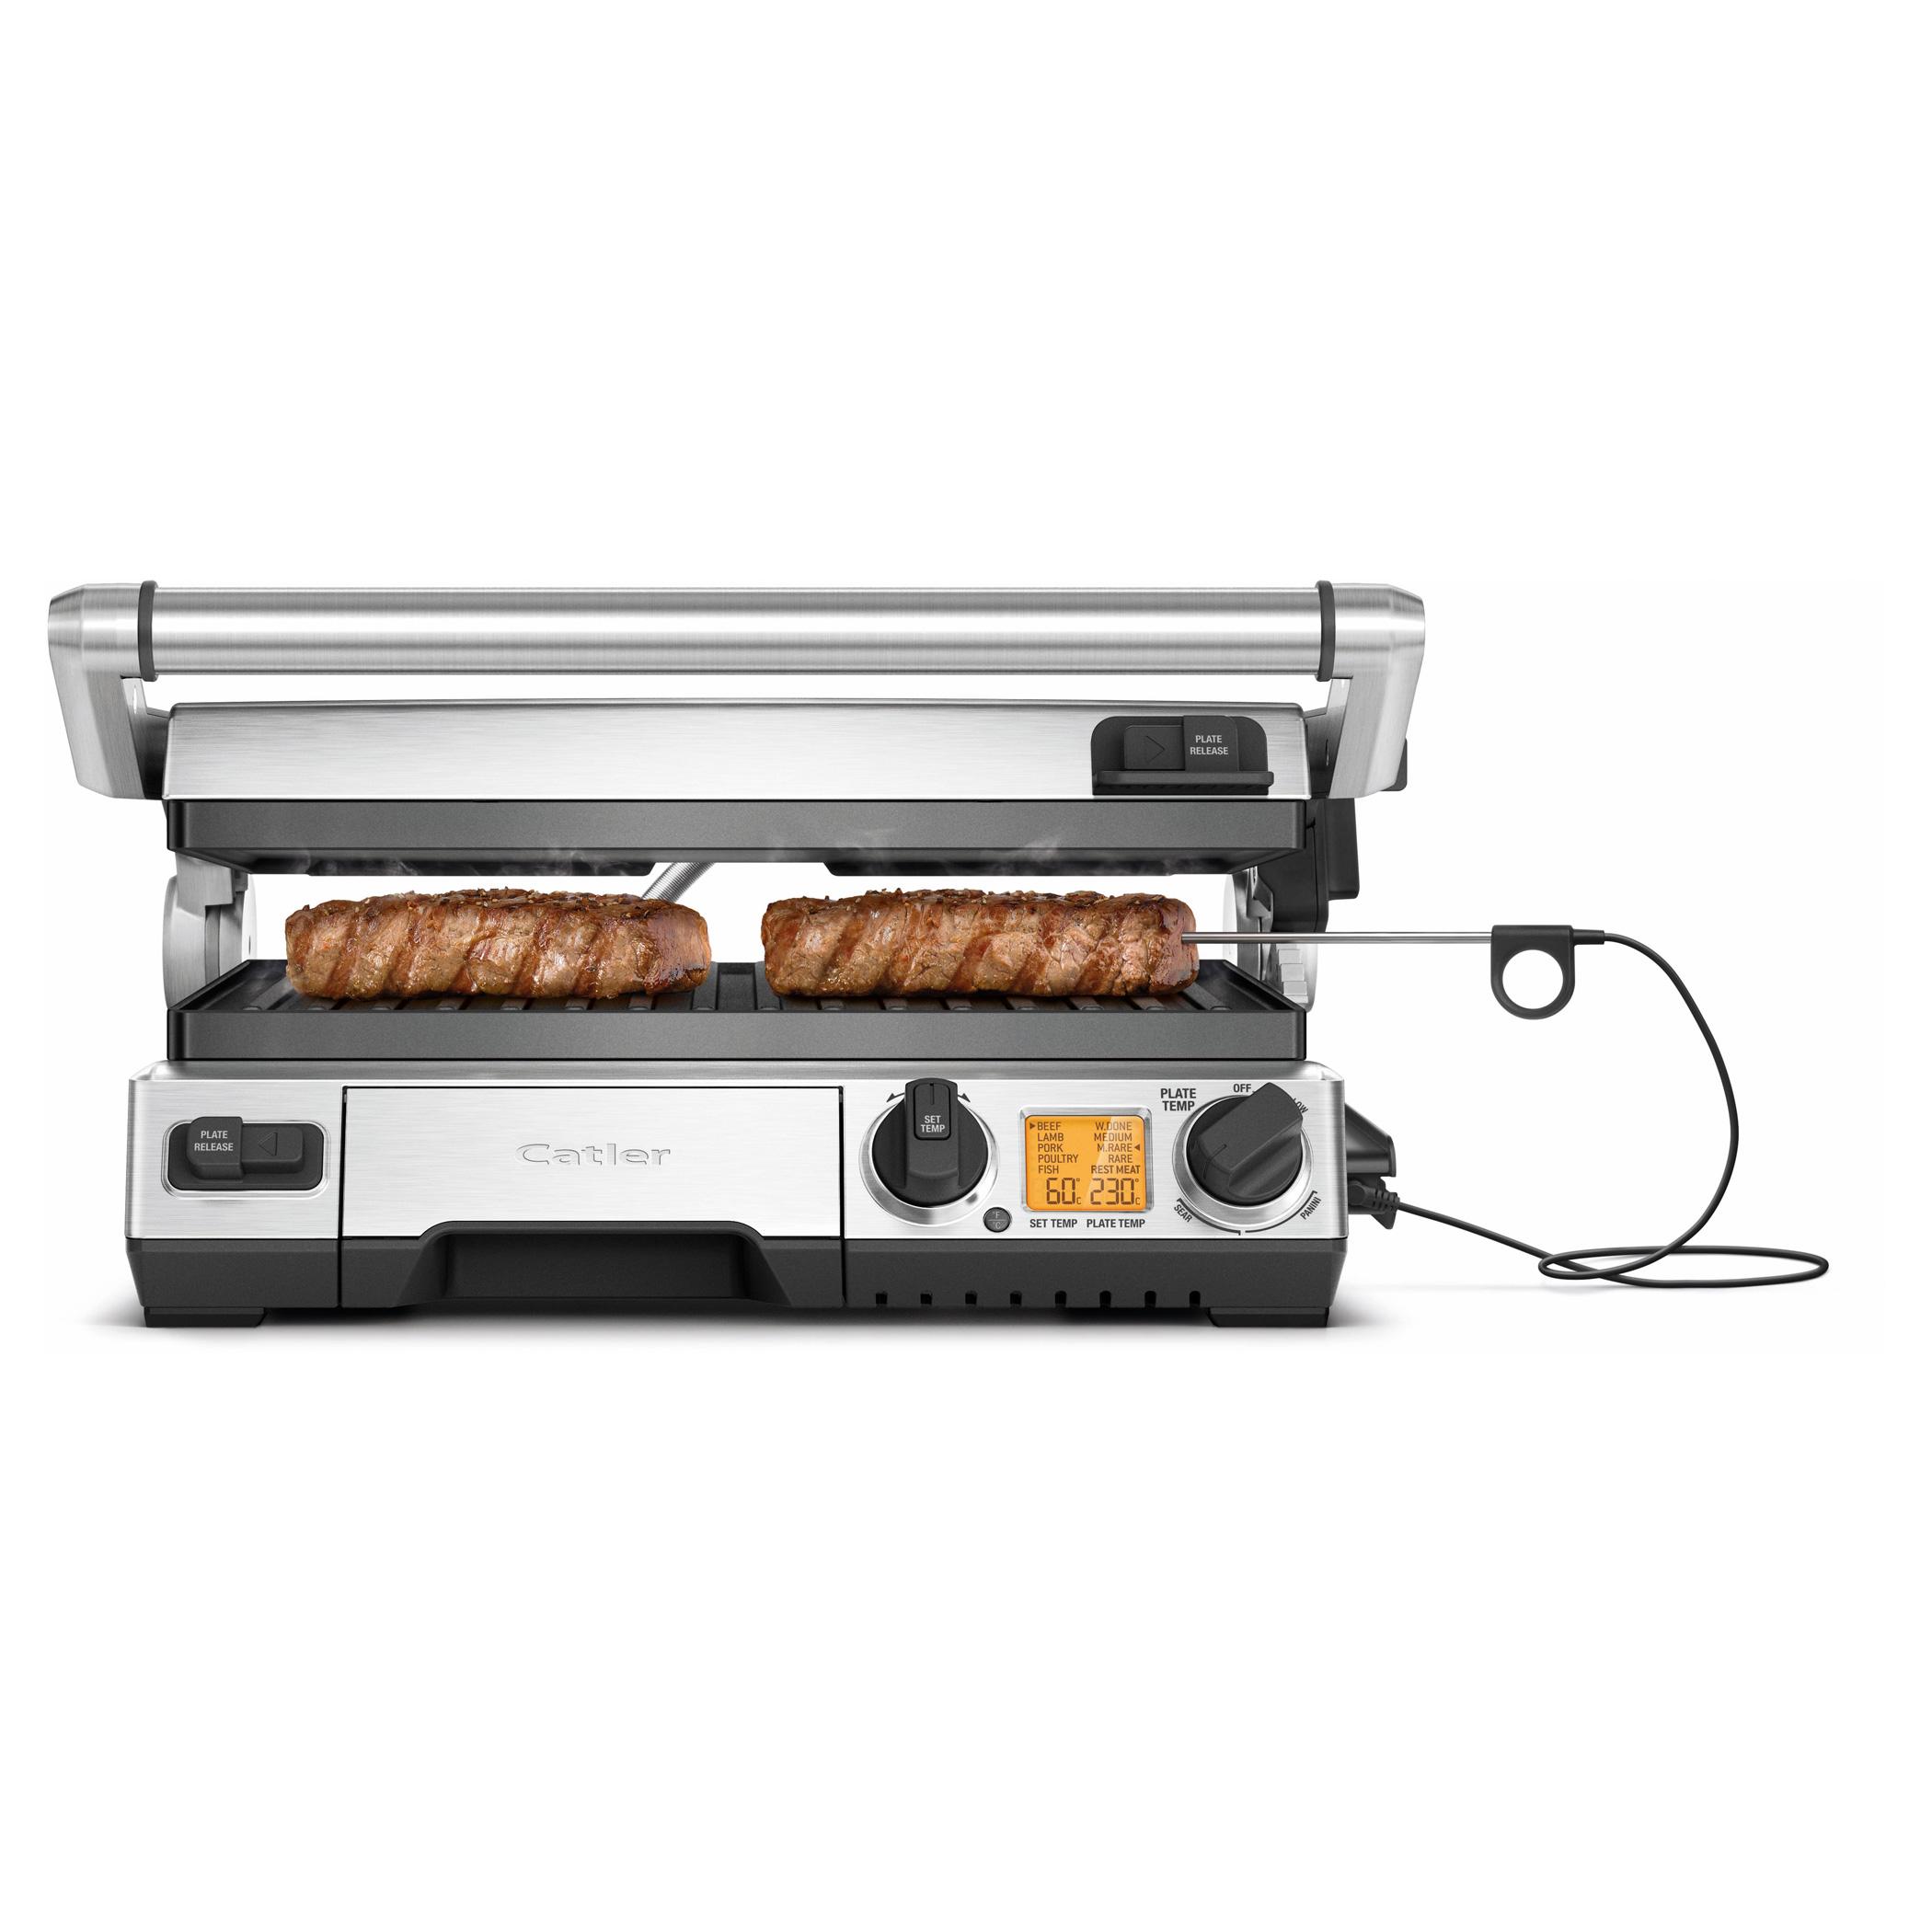 accents toaster itm morphy sentinel damaged white smart richards box